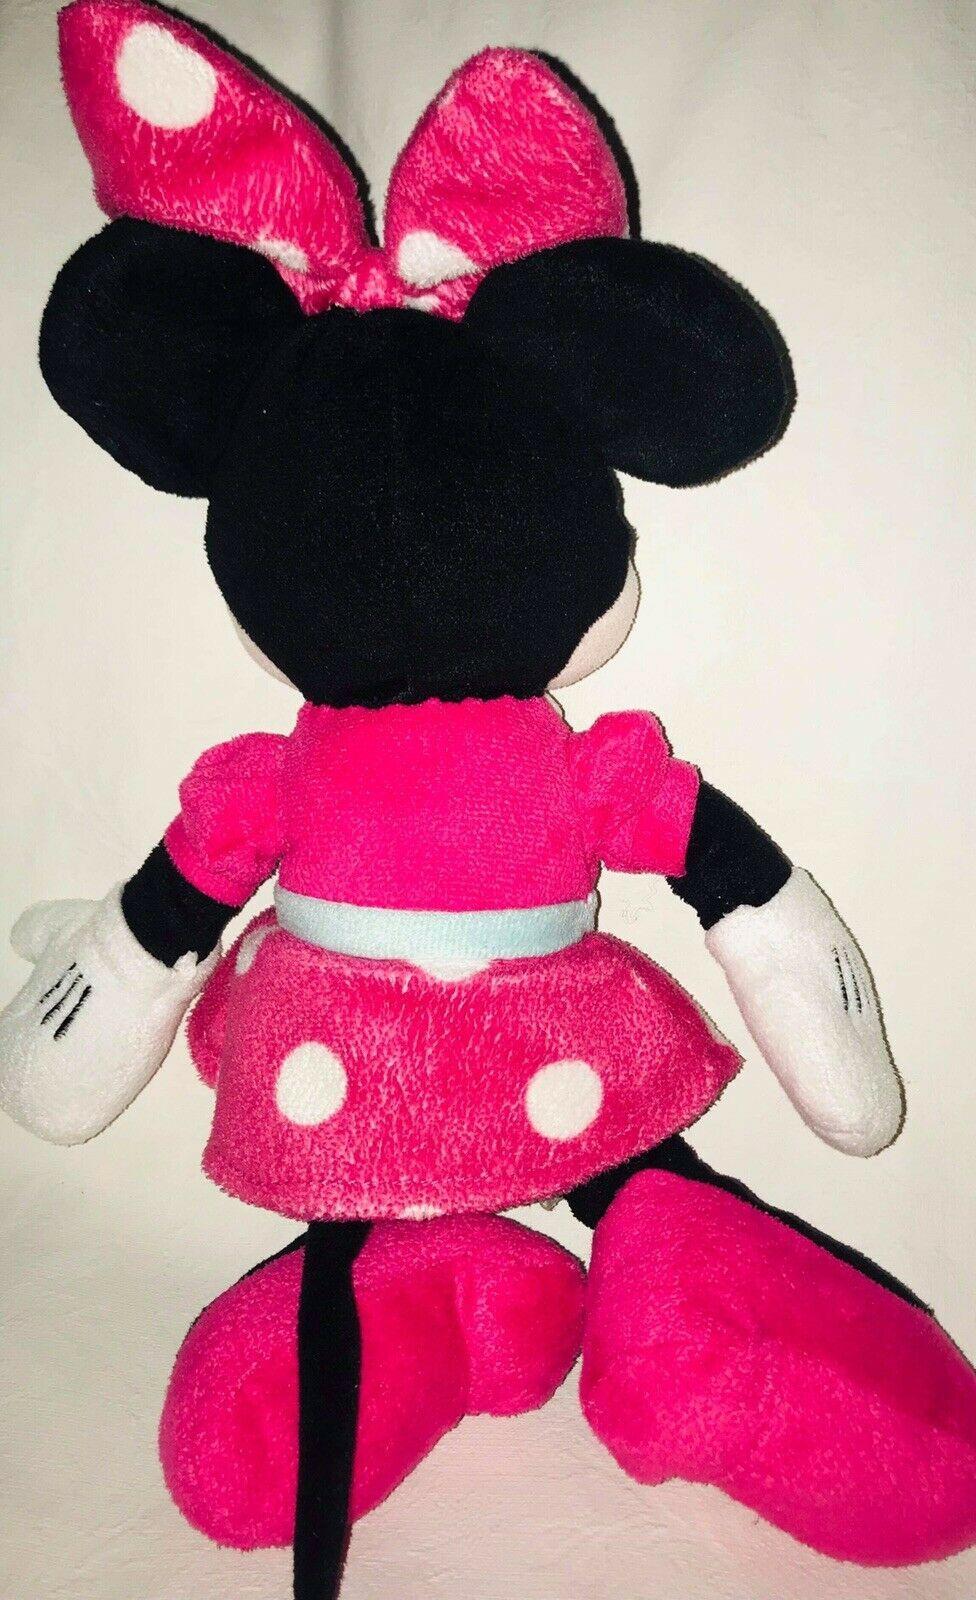 "Disney Minnie Mouse Plush Pink Polka Dot  Stuffed Animal Doll 15"" image 4"